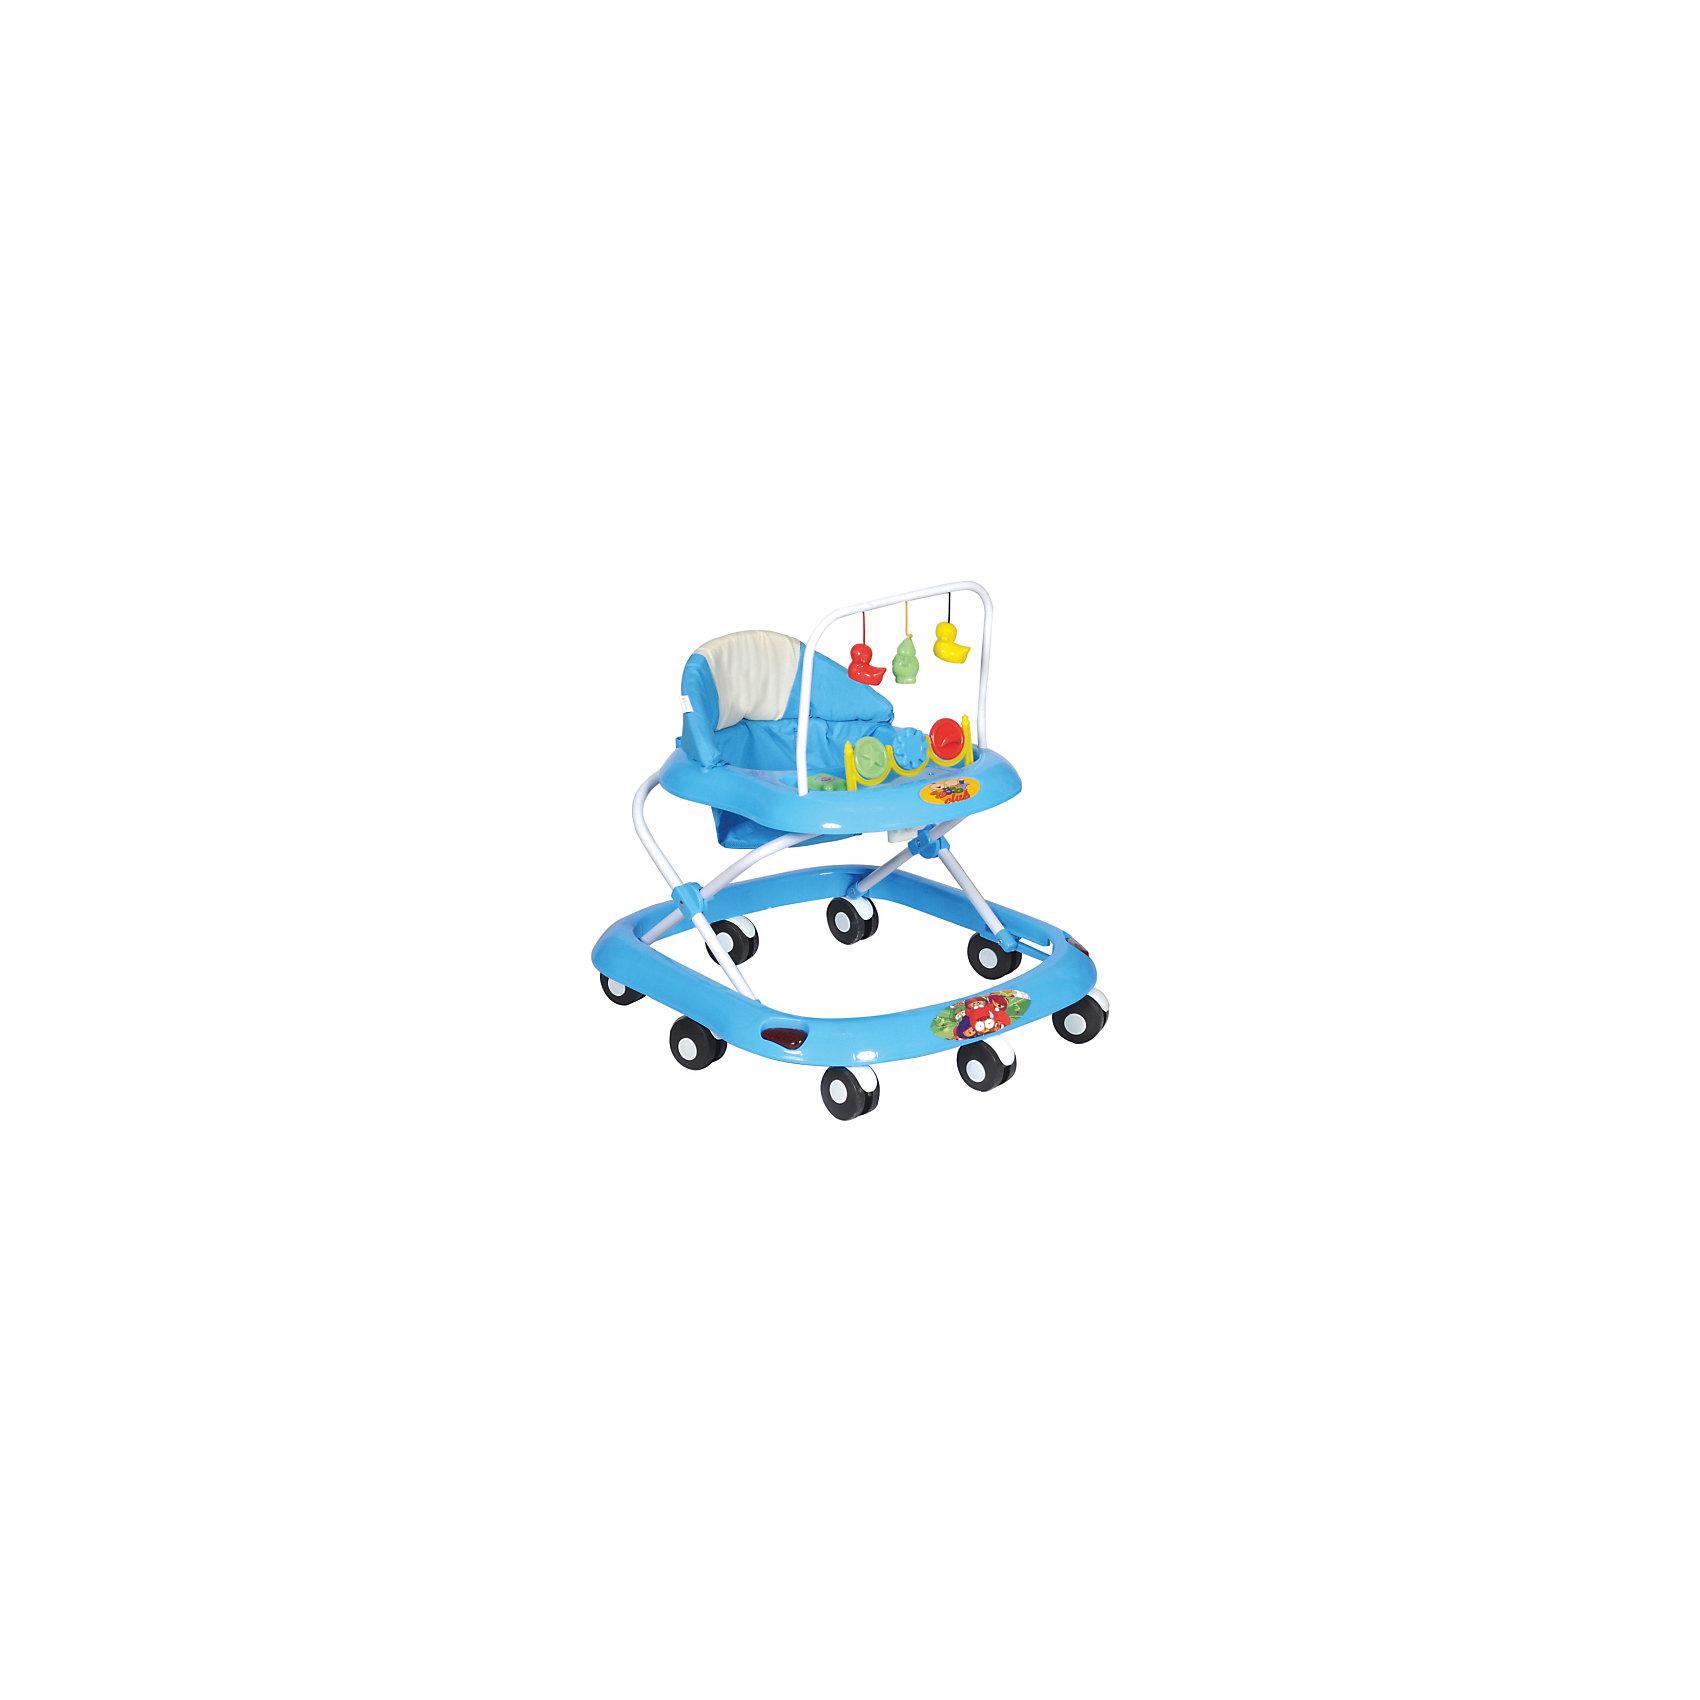 Ходунки Игрушки, Shine Ring, голубойSHINE RING  Ходунки (8 колес,игрушки,муз) 6 шт в кор.(67*60*52), BLUE/ Голубой<br><br>Ширина мм: 670<br>Глубина мм: 600<br>Высота мм: 520<br>Вес г: 2550<br>Возраст от месяцев: 6<br>Возраст до месяцев: 12<br>Пол: Унисекс<br>Возраст: Детский<br>SKU: 5559226